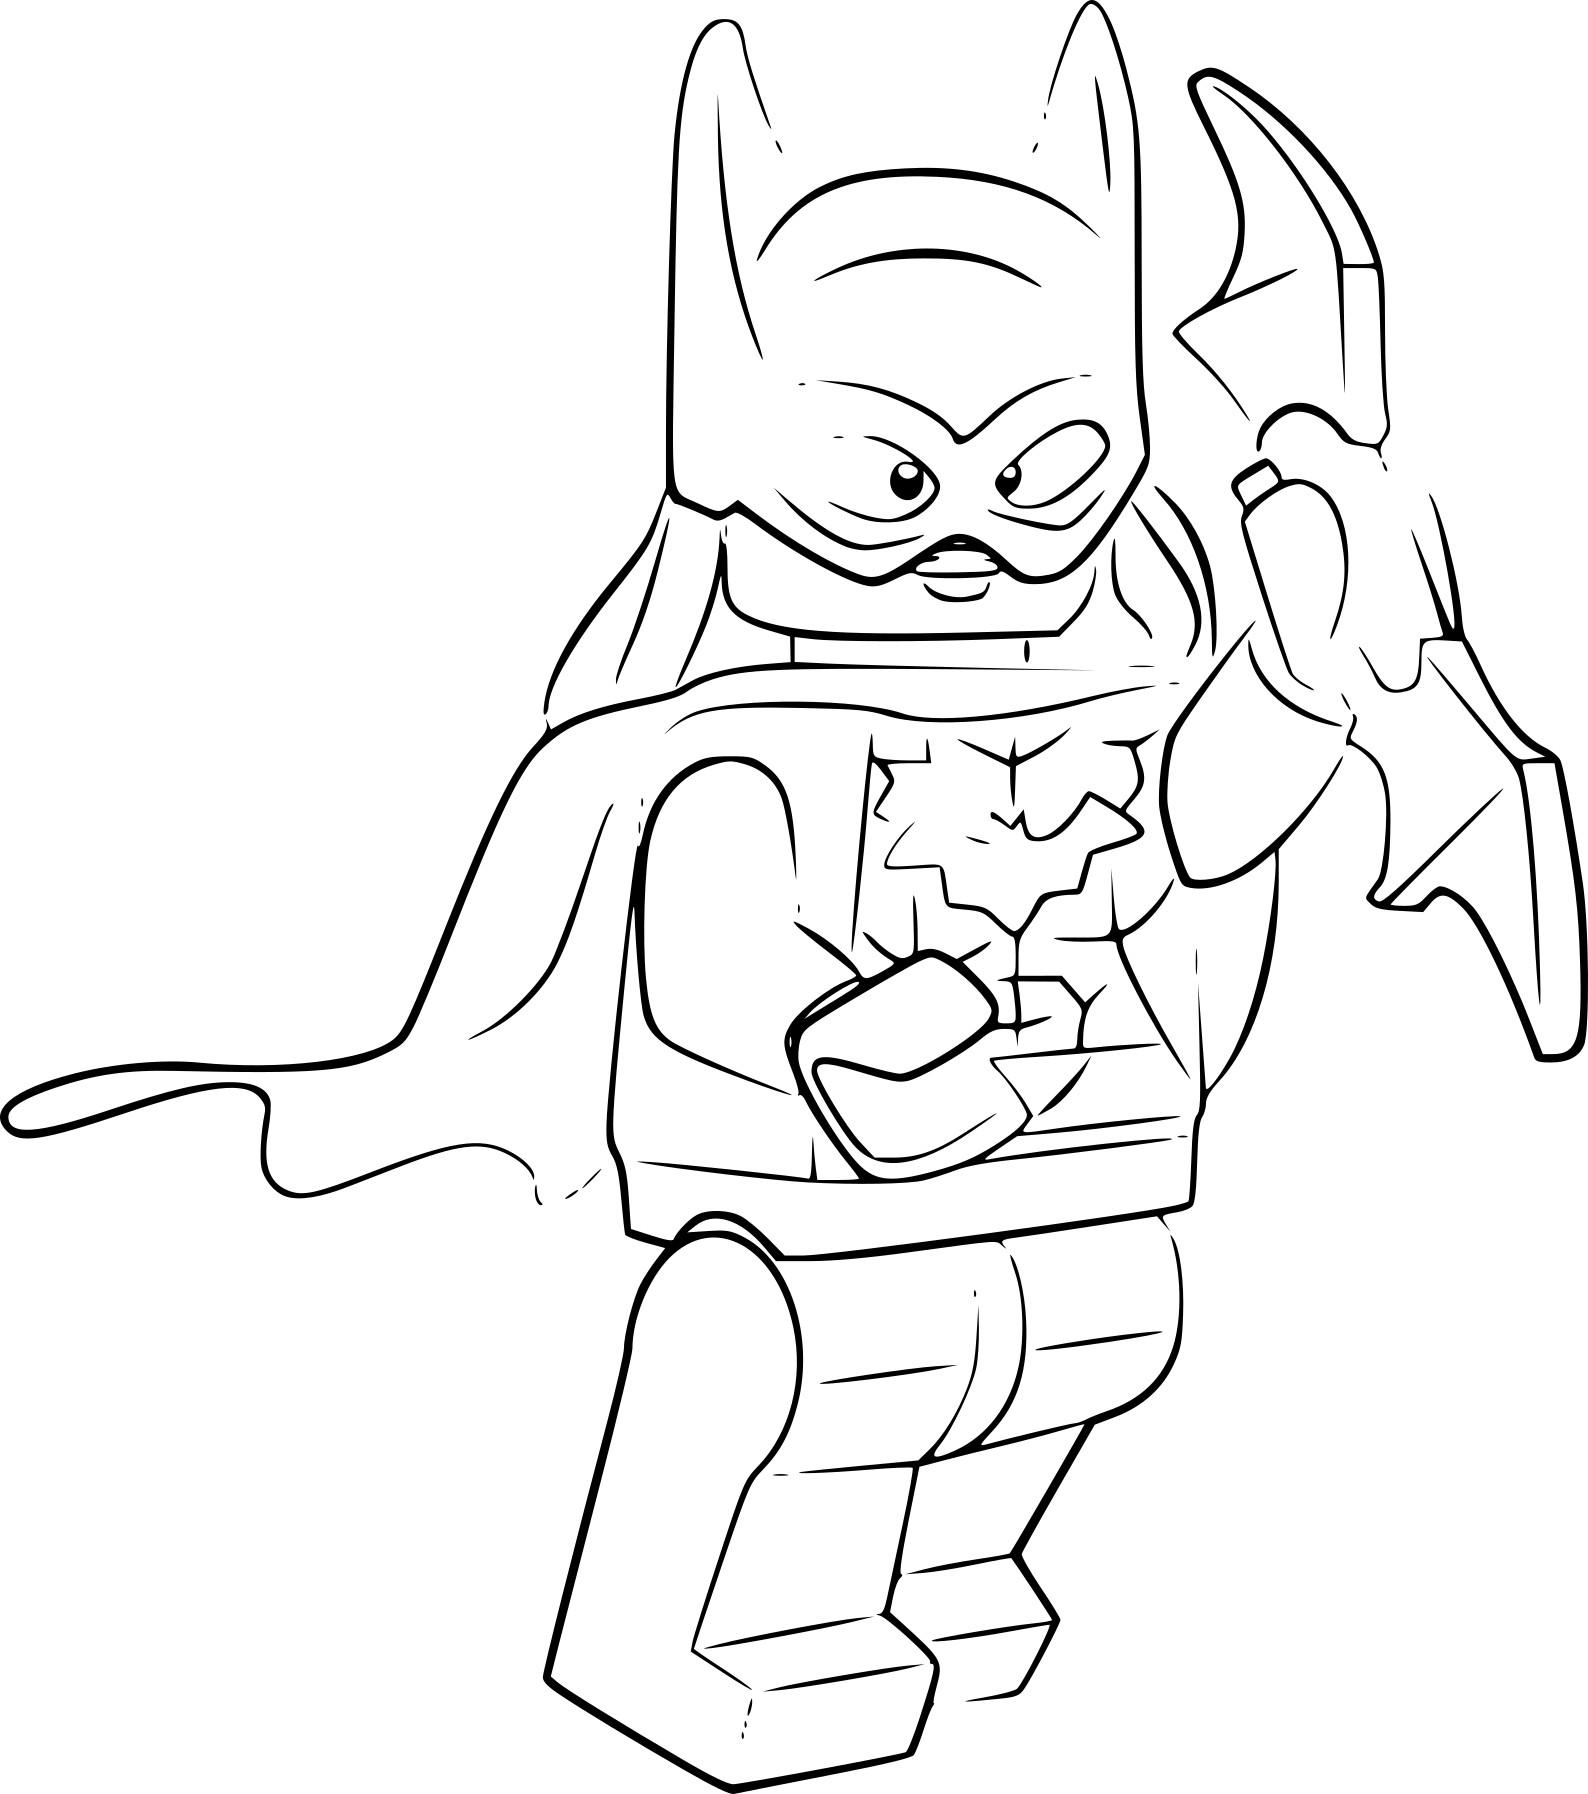 Coloriage lego batgirl imprimer - Lego coloriage ...